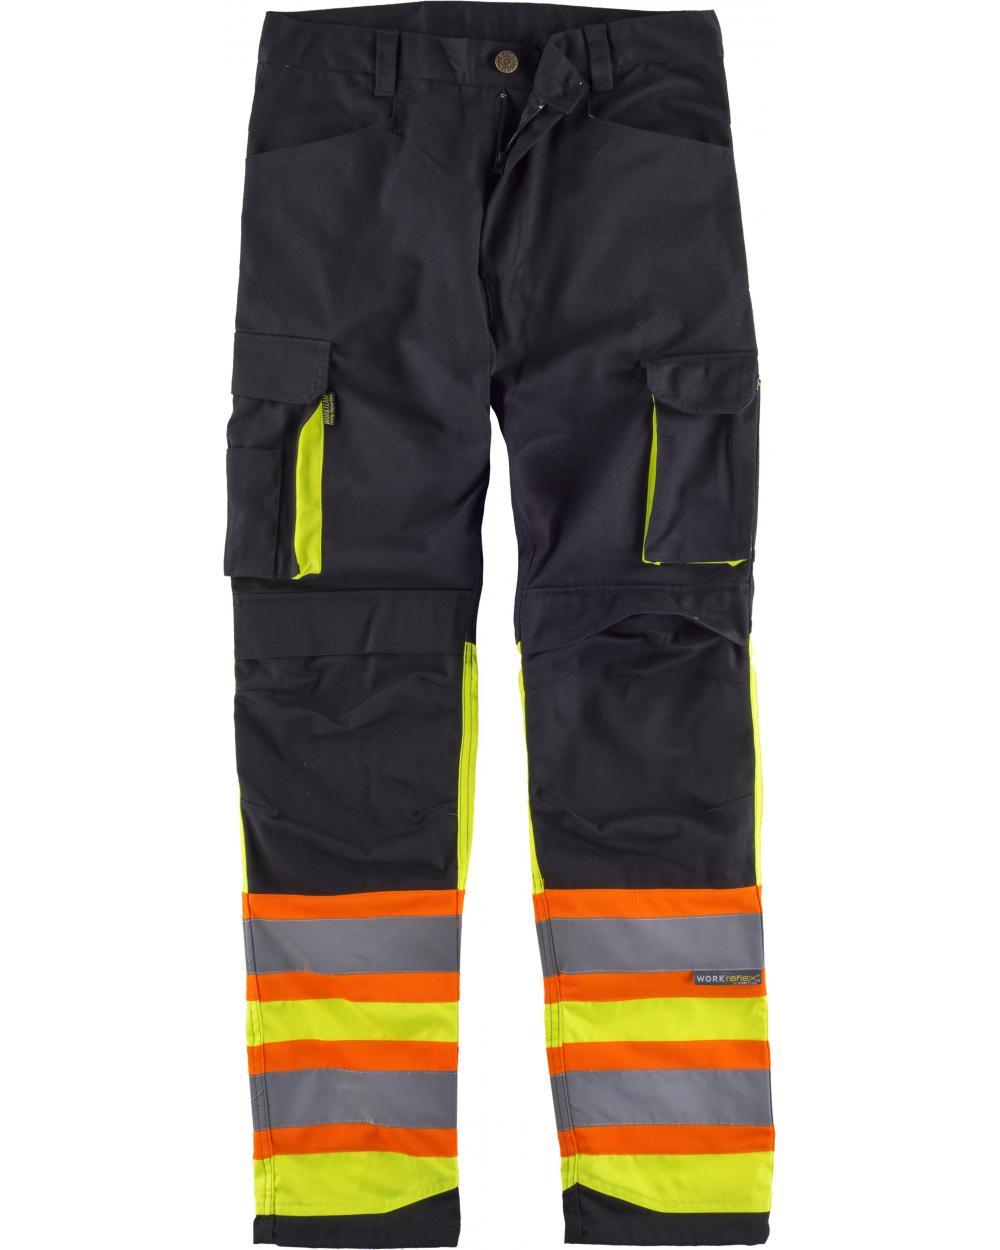 Comprar Pantalon combinado multibolsillos C2618 Negro+Amarillo AV workteam delante